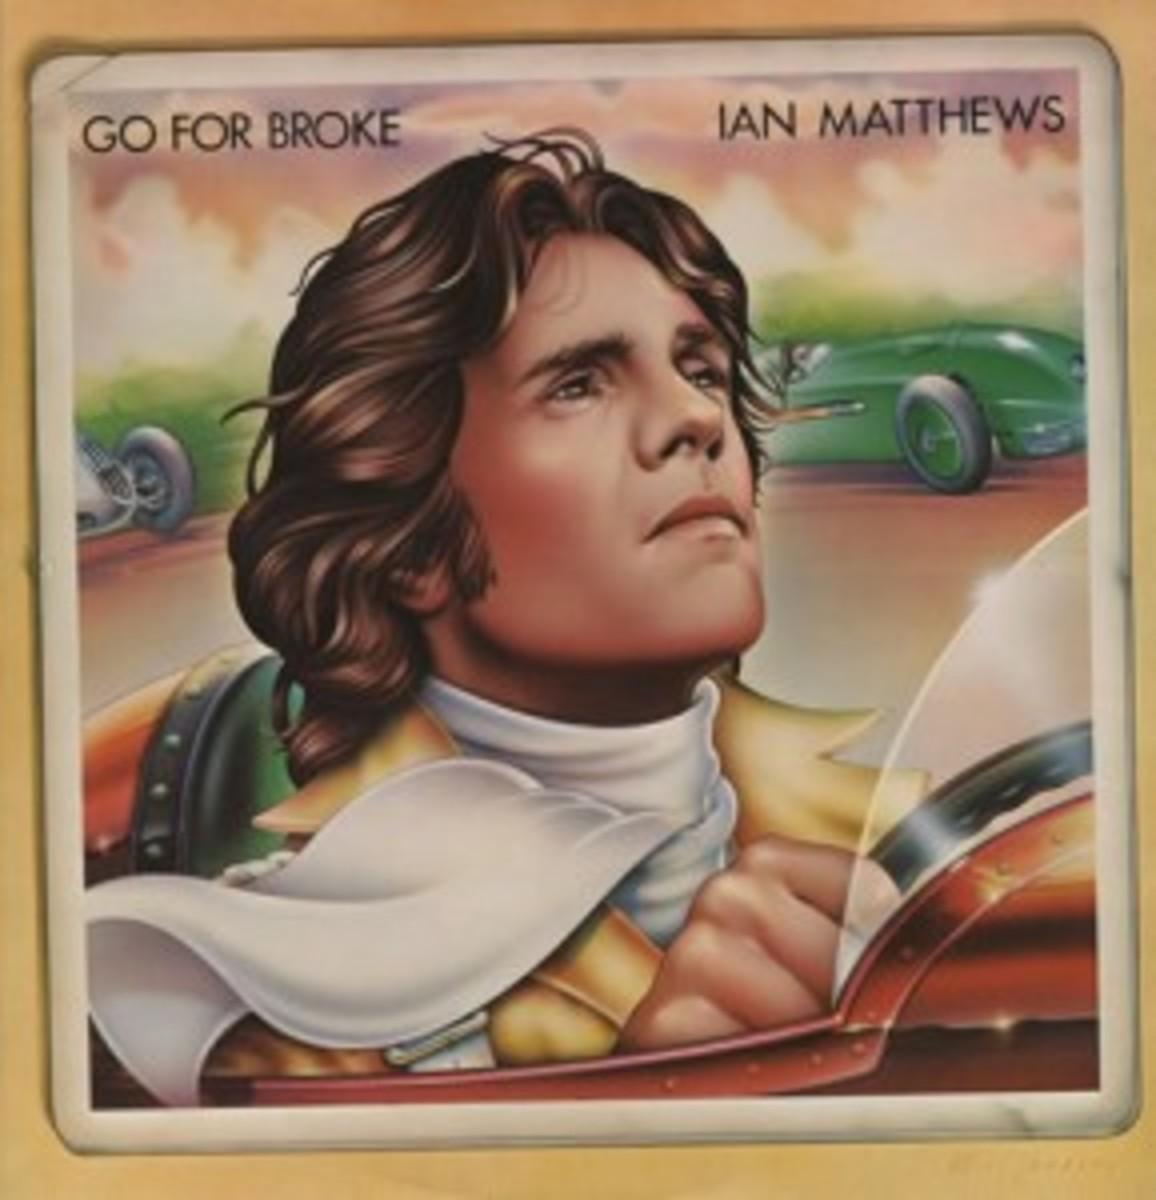 ian_matthews-go_for_broke